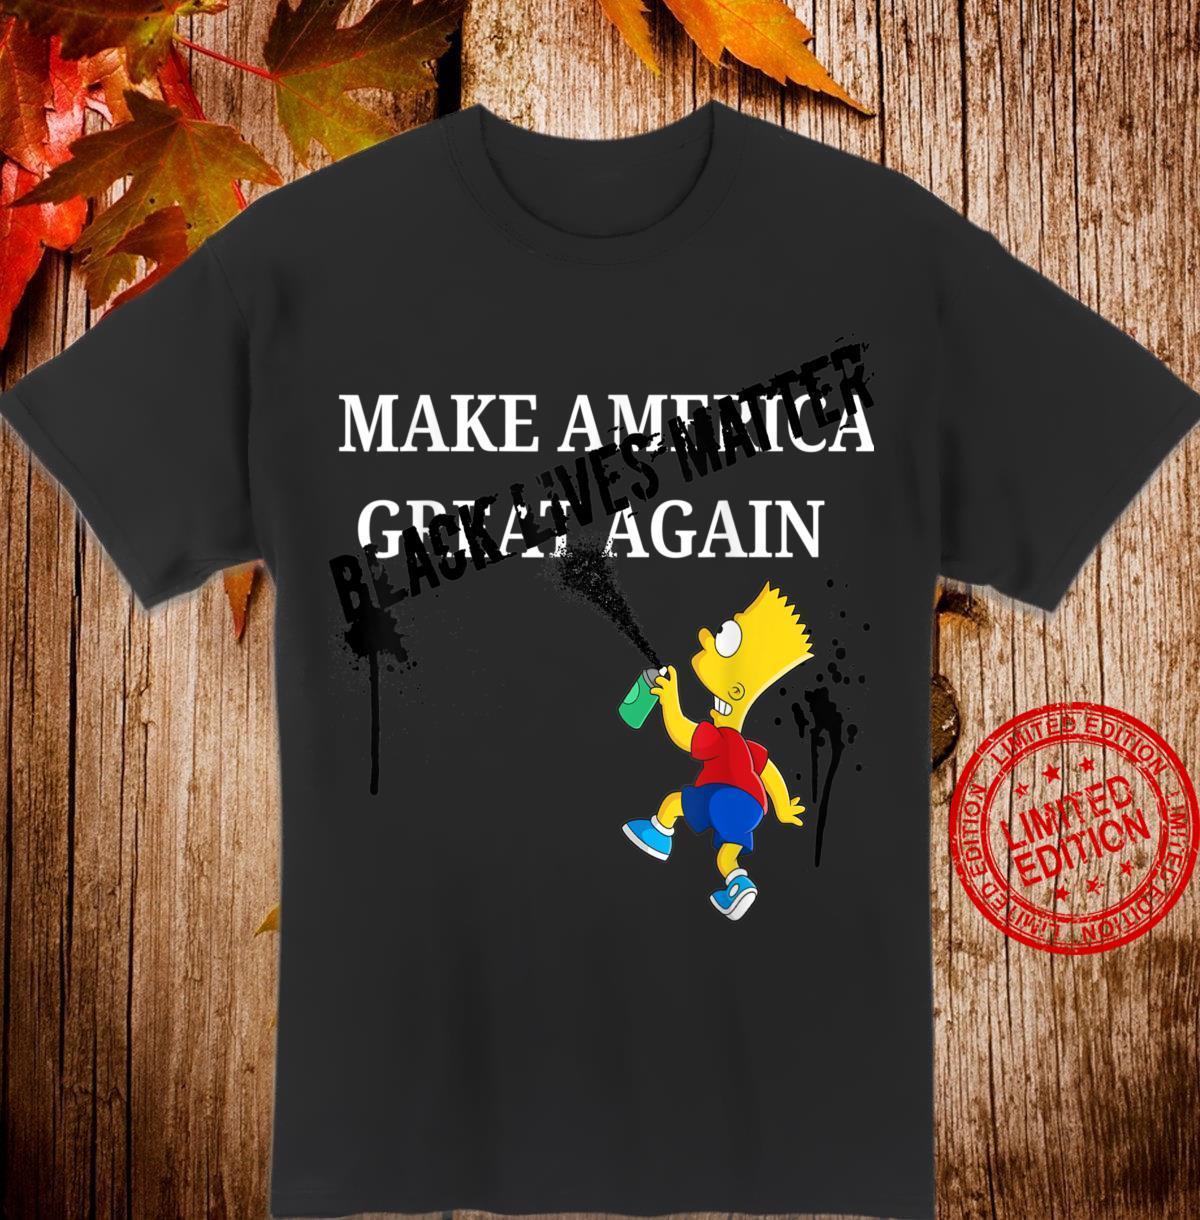 Black Lives Matter History Civil Rights Unisex BLM Shirt